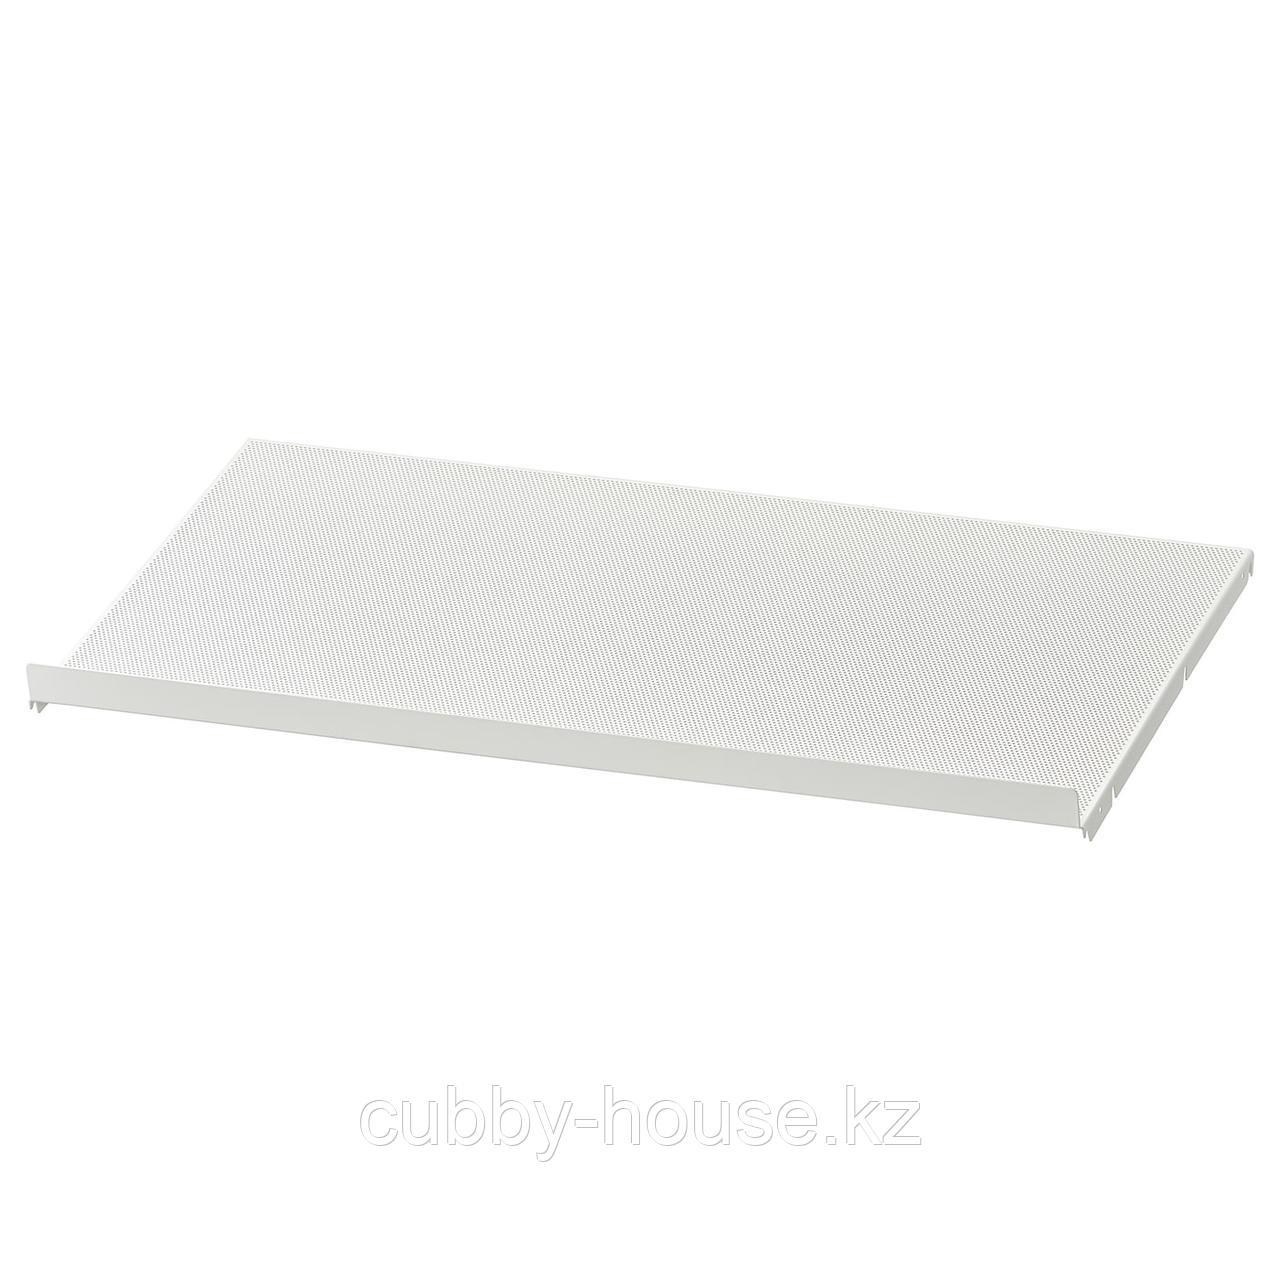 ХЭЛПА Полка для обуви, белый, 80x40 см